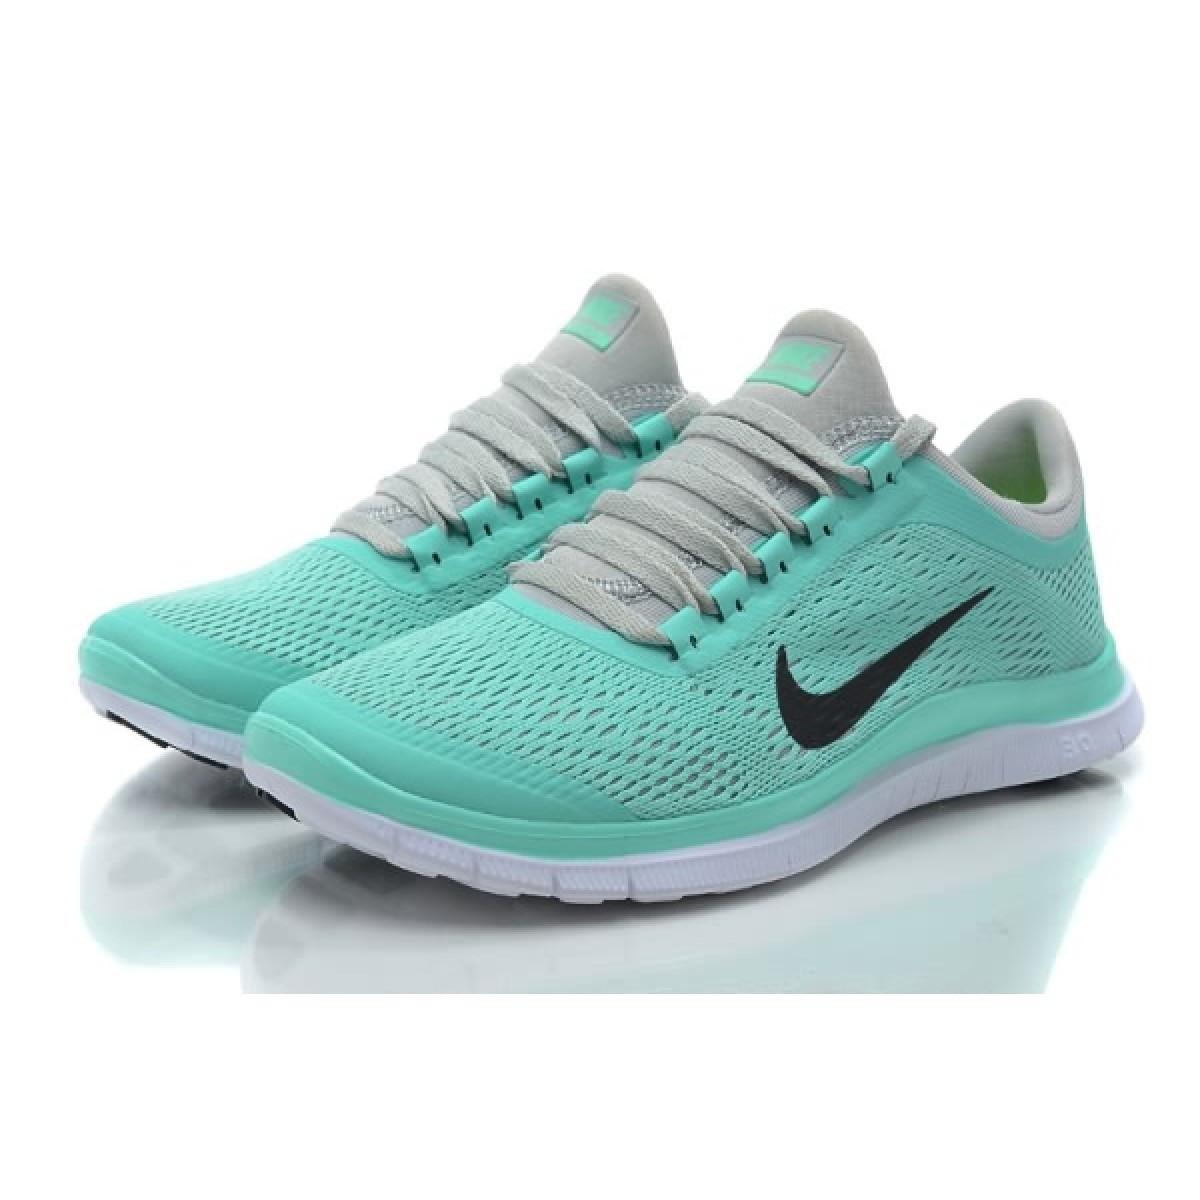 quality design 868ca 664d3 Nike Sock Dart Men's Shoes Black/volt